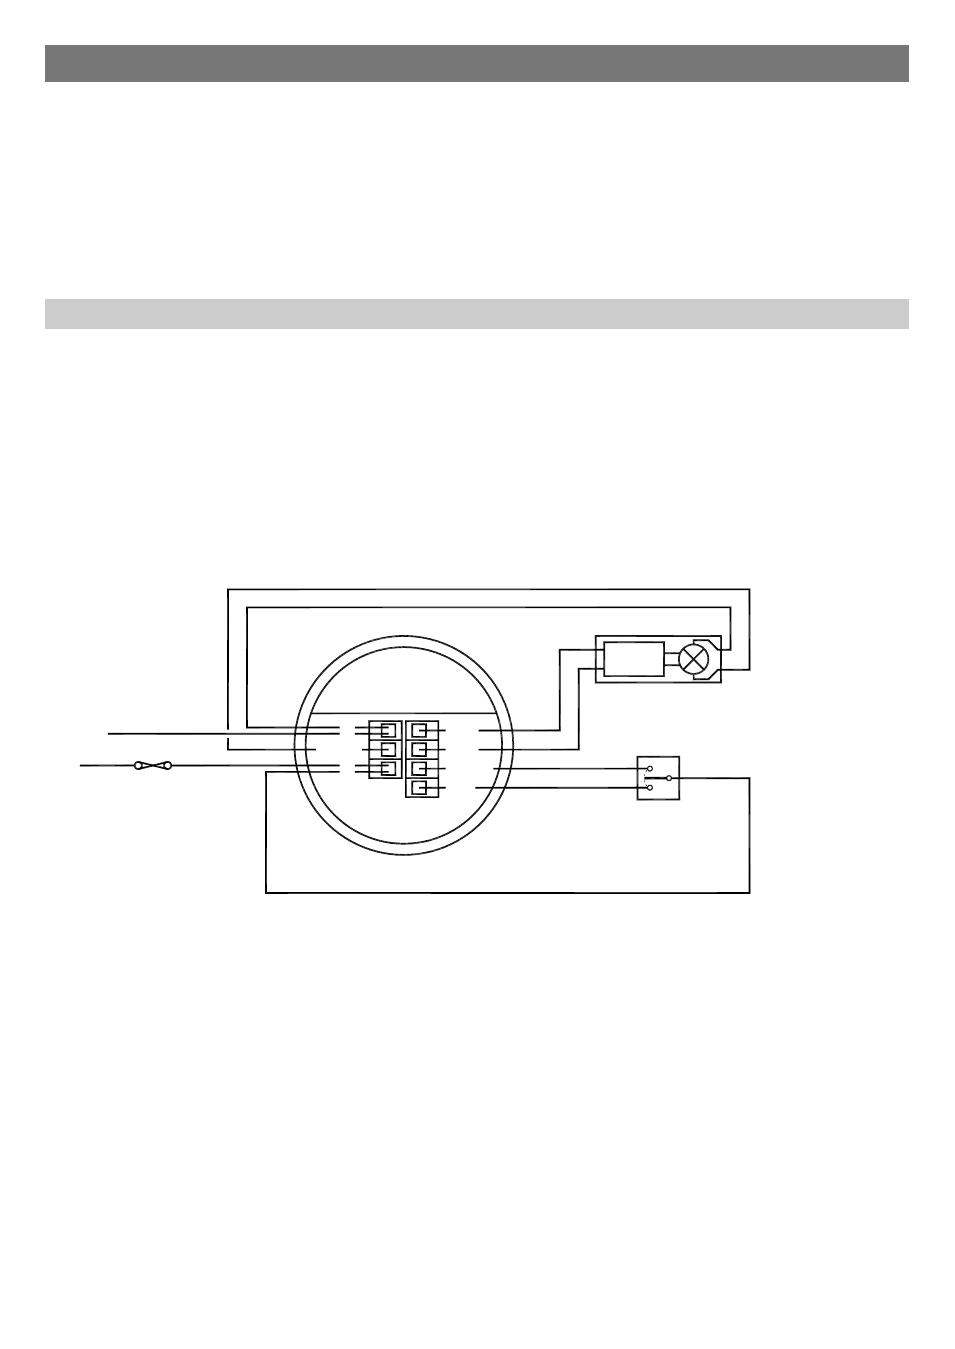 retractive switch wiring diagram